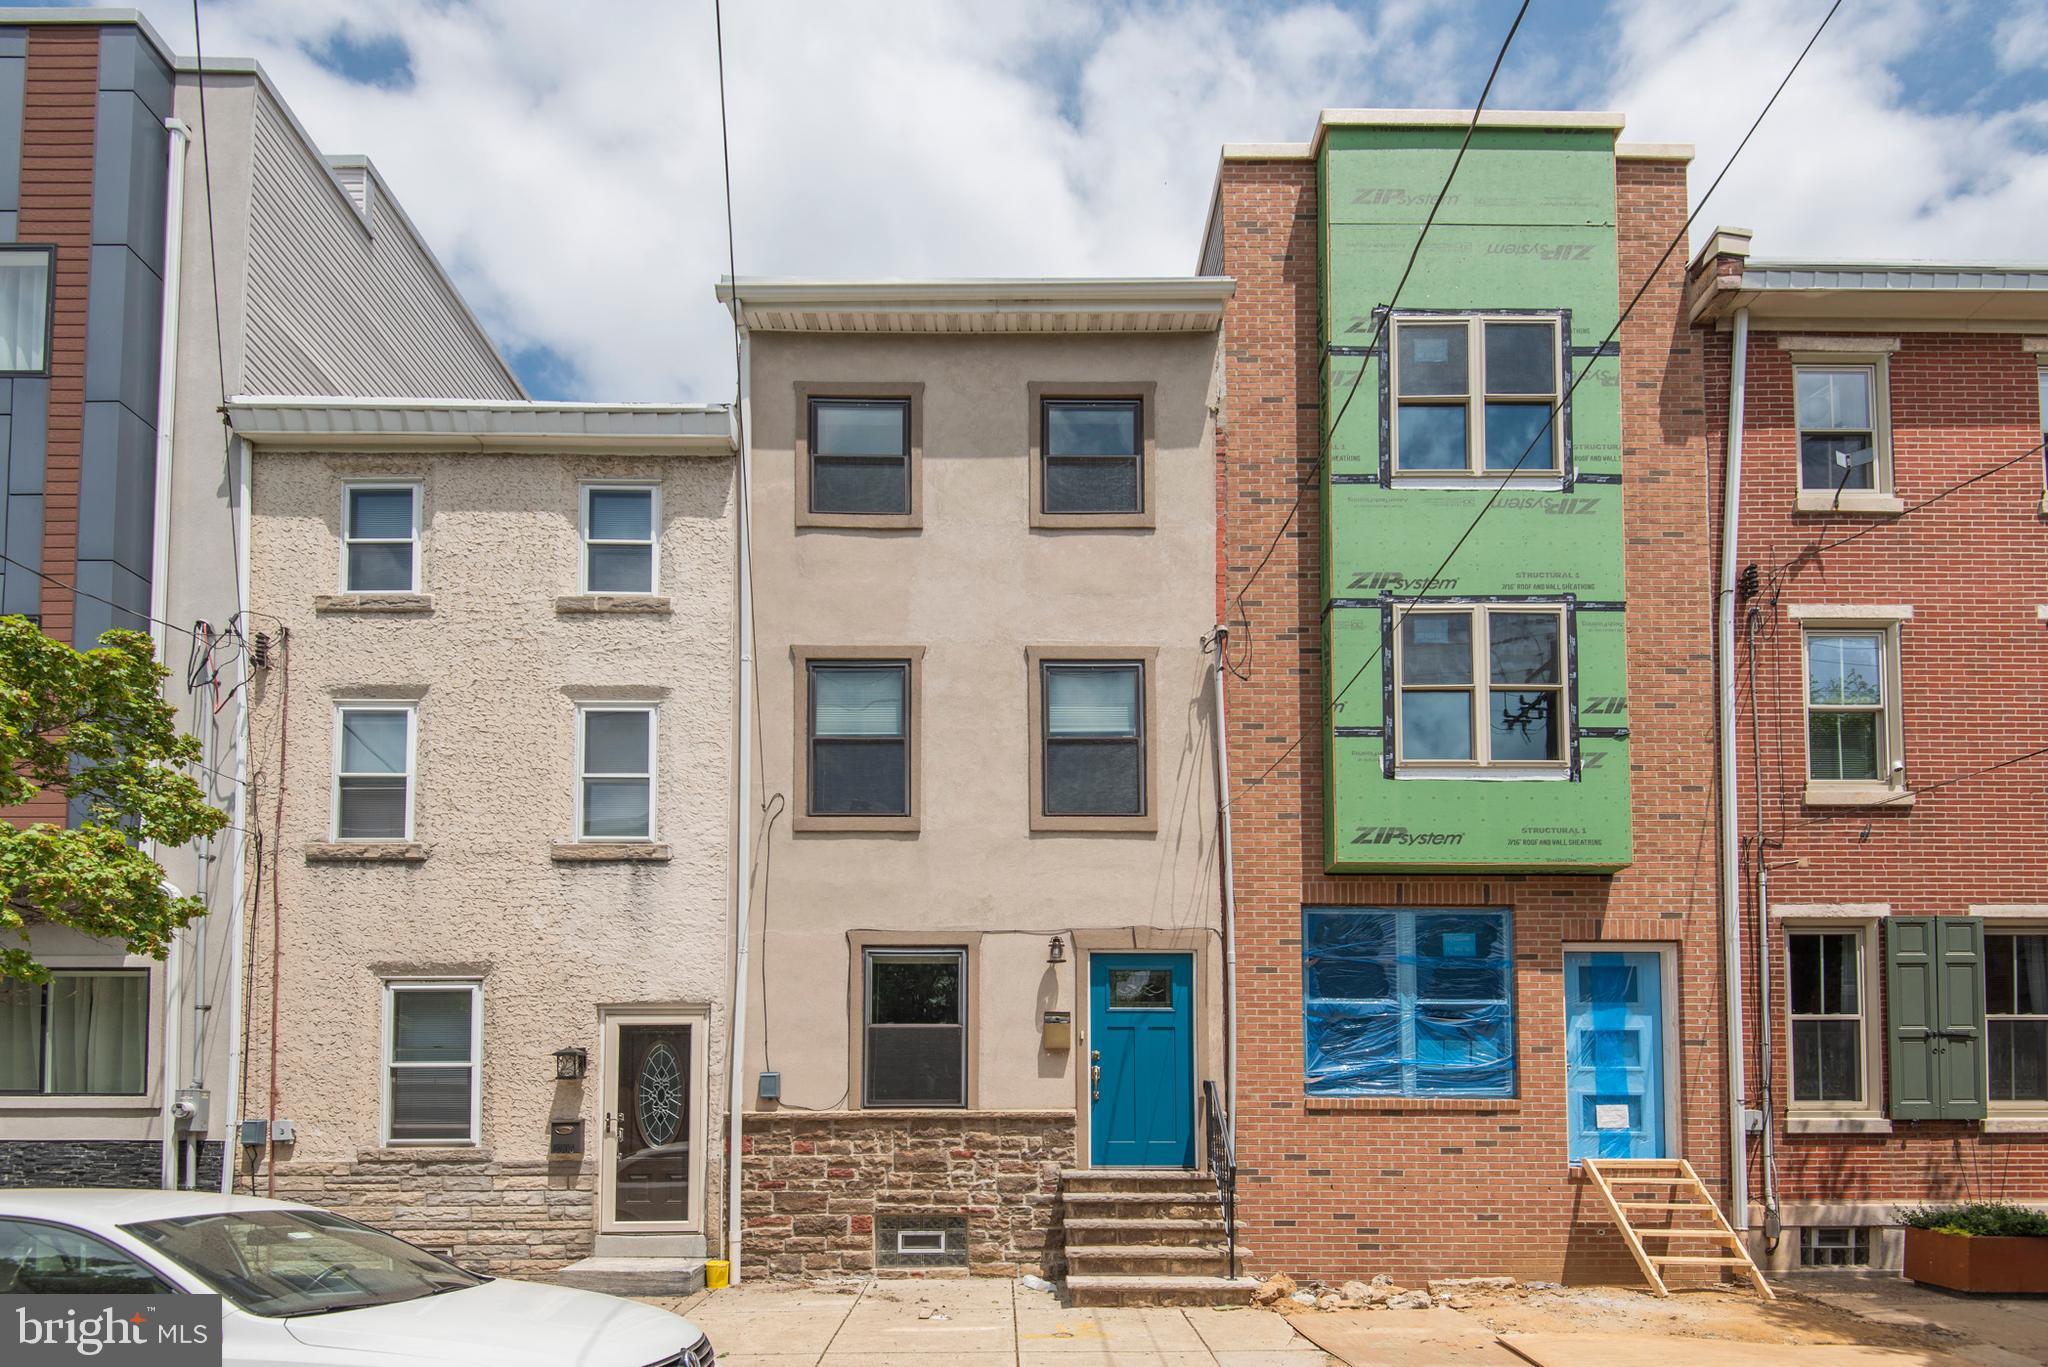 2307 E Dauphin Street, Philadelphia, PA 19125